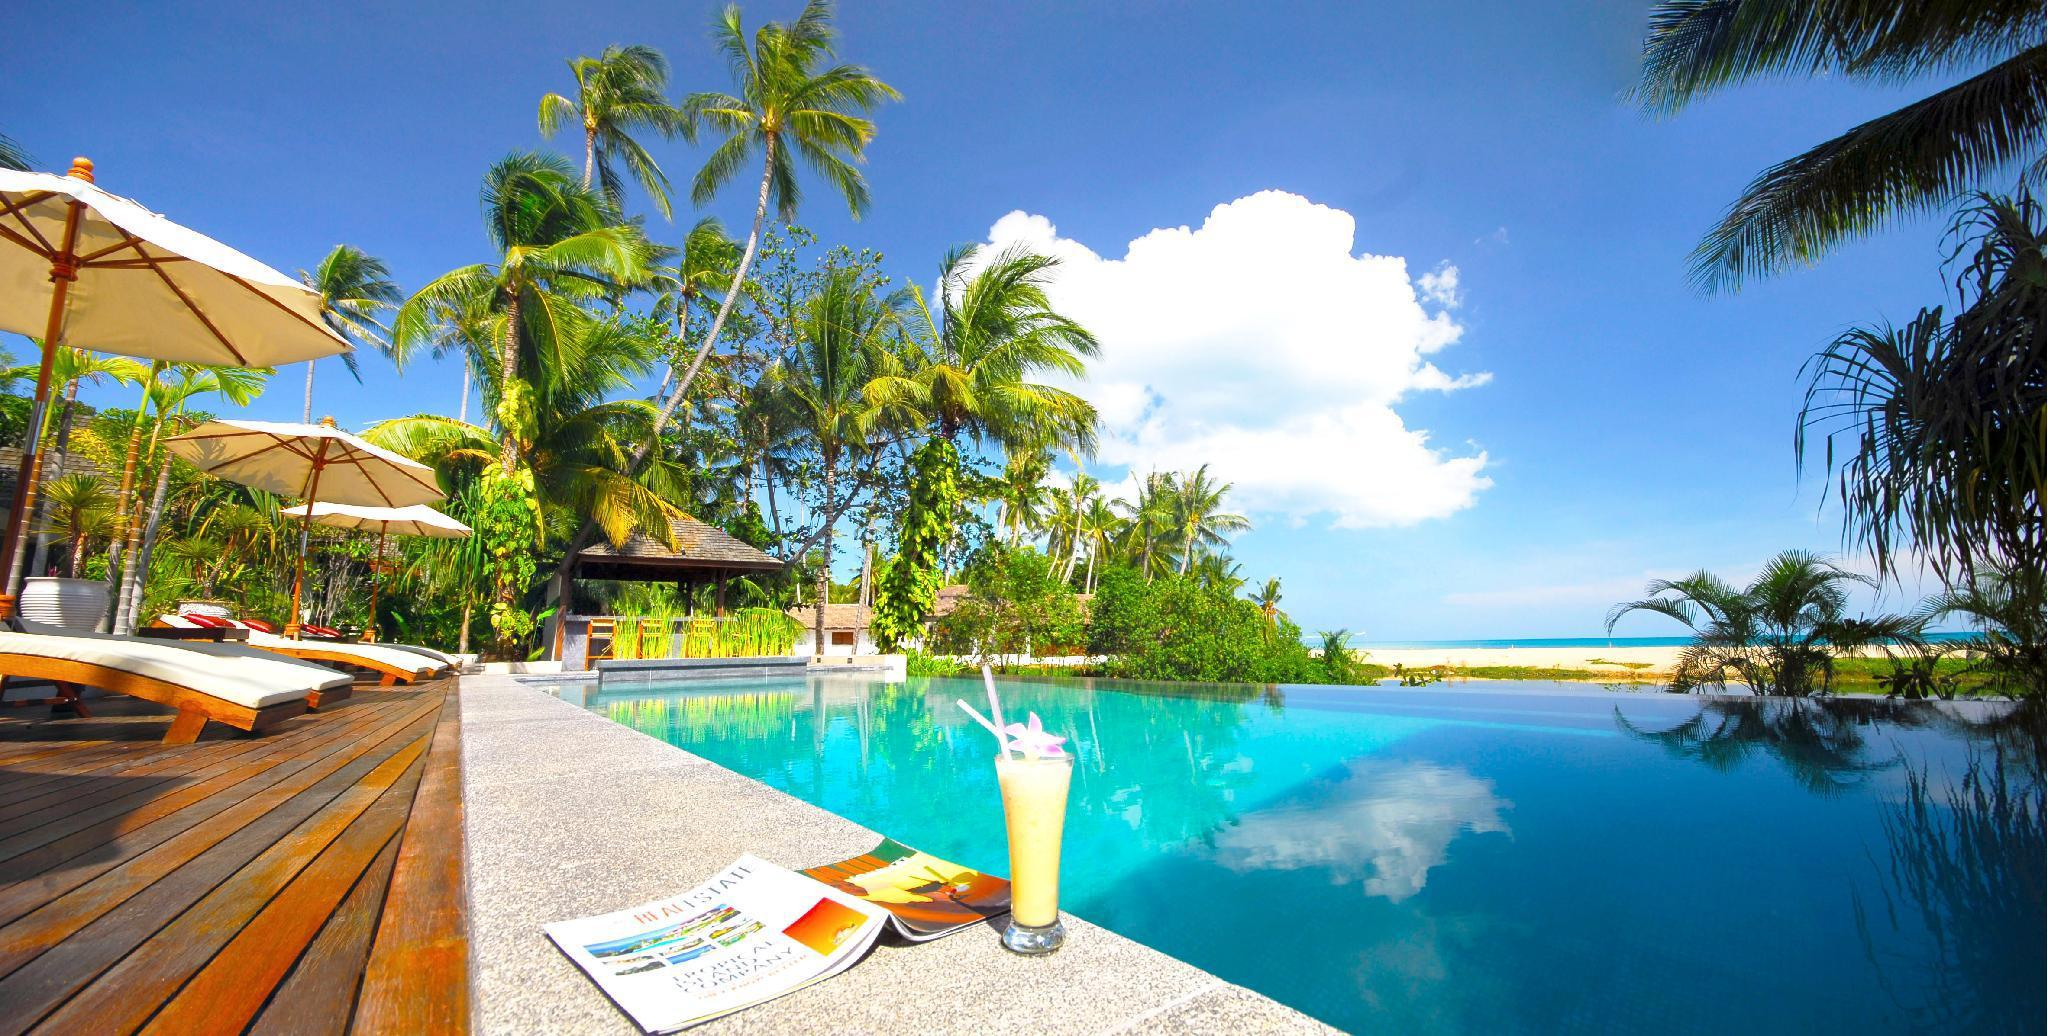 Zara Beach Resort Koh Samui เดอะ ซารา บีช รีสอร์ต เกาะสมุย